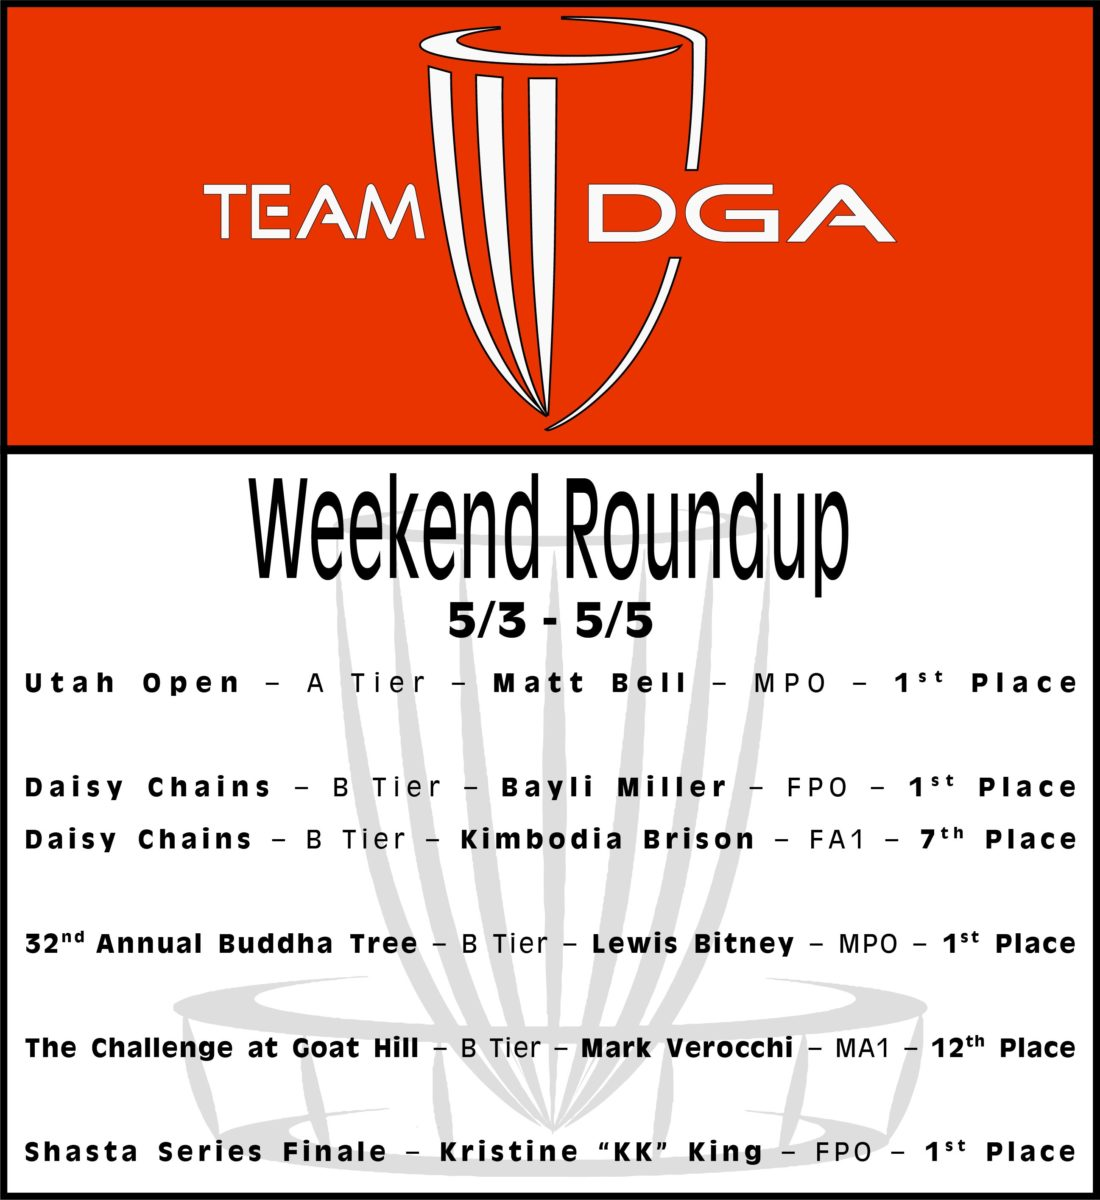 Team DGA Weekend Roundup 5/3 - 5/5